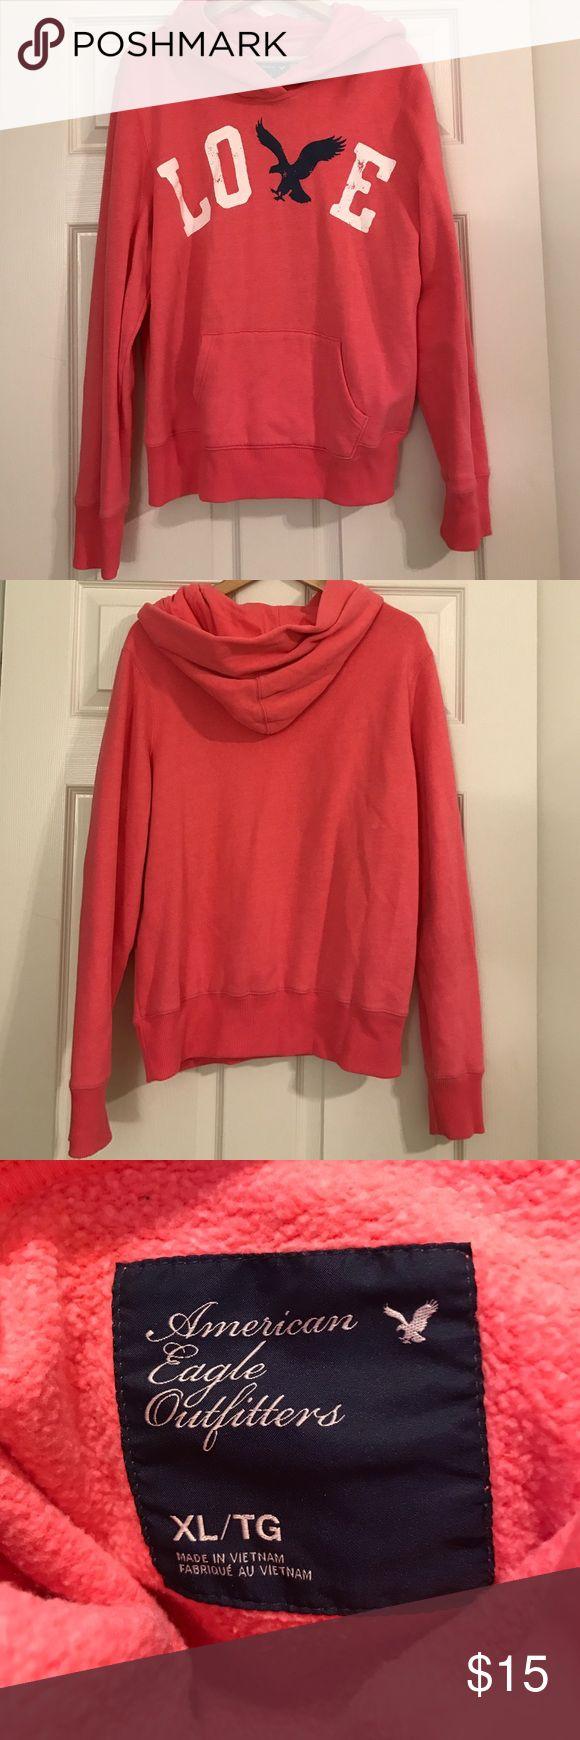 American eagle sweatshirt American eagle sweatshirt American Eagle Outfitters Tops Sweatshirts & Hoodies